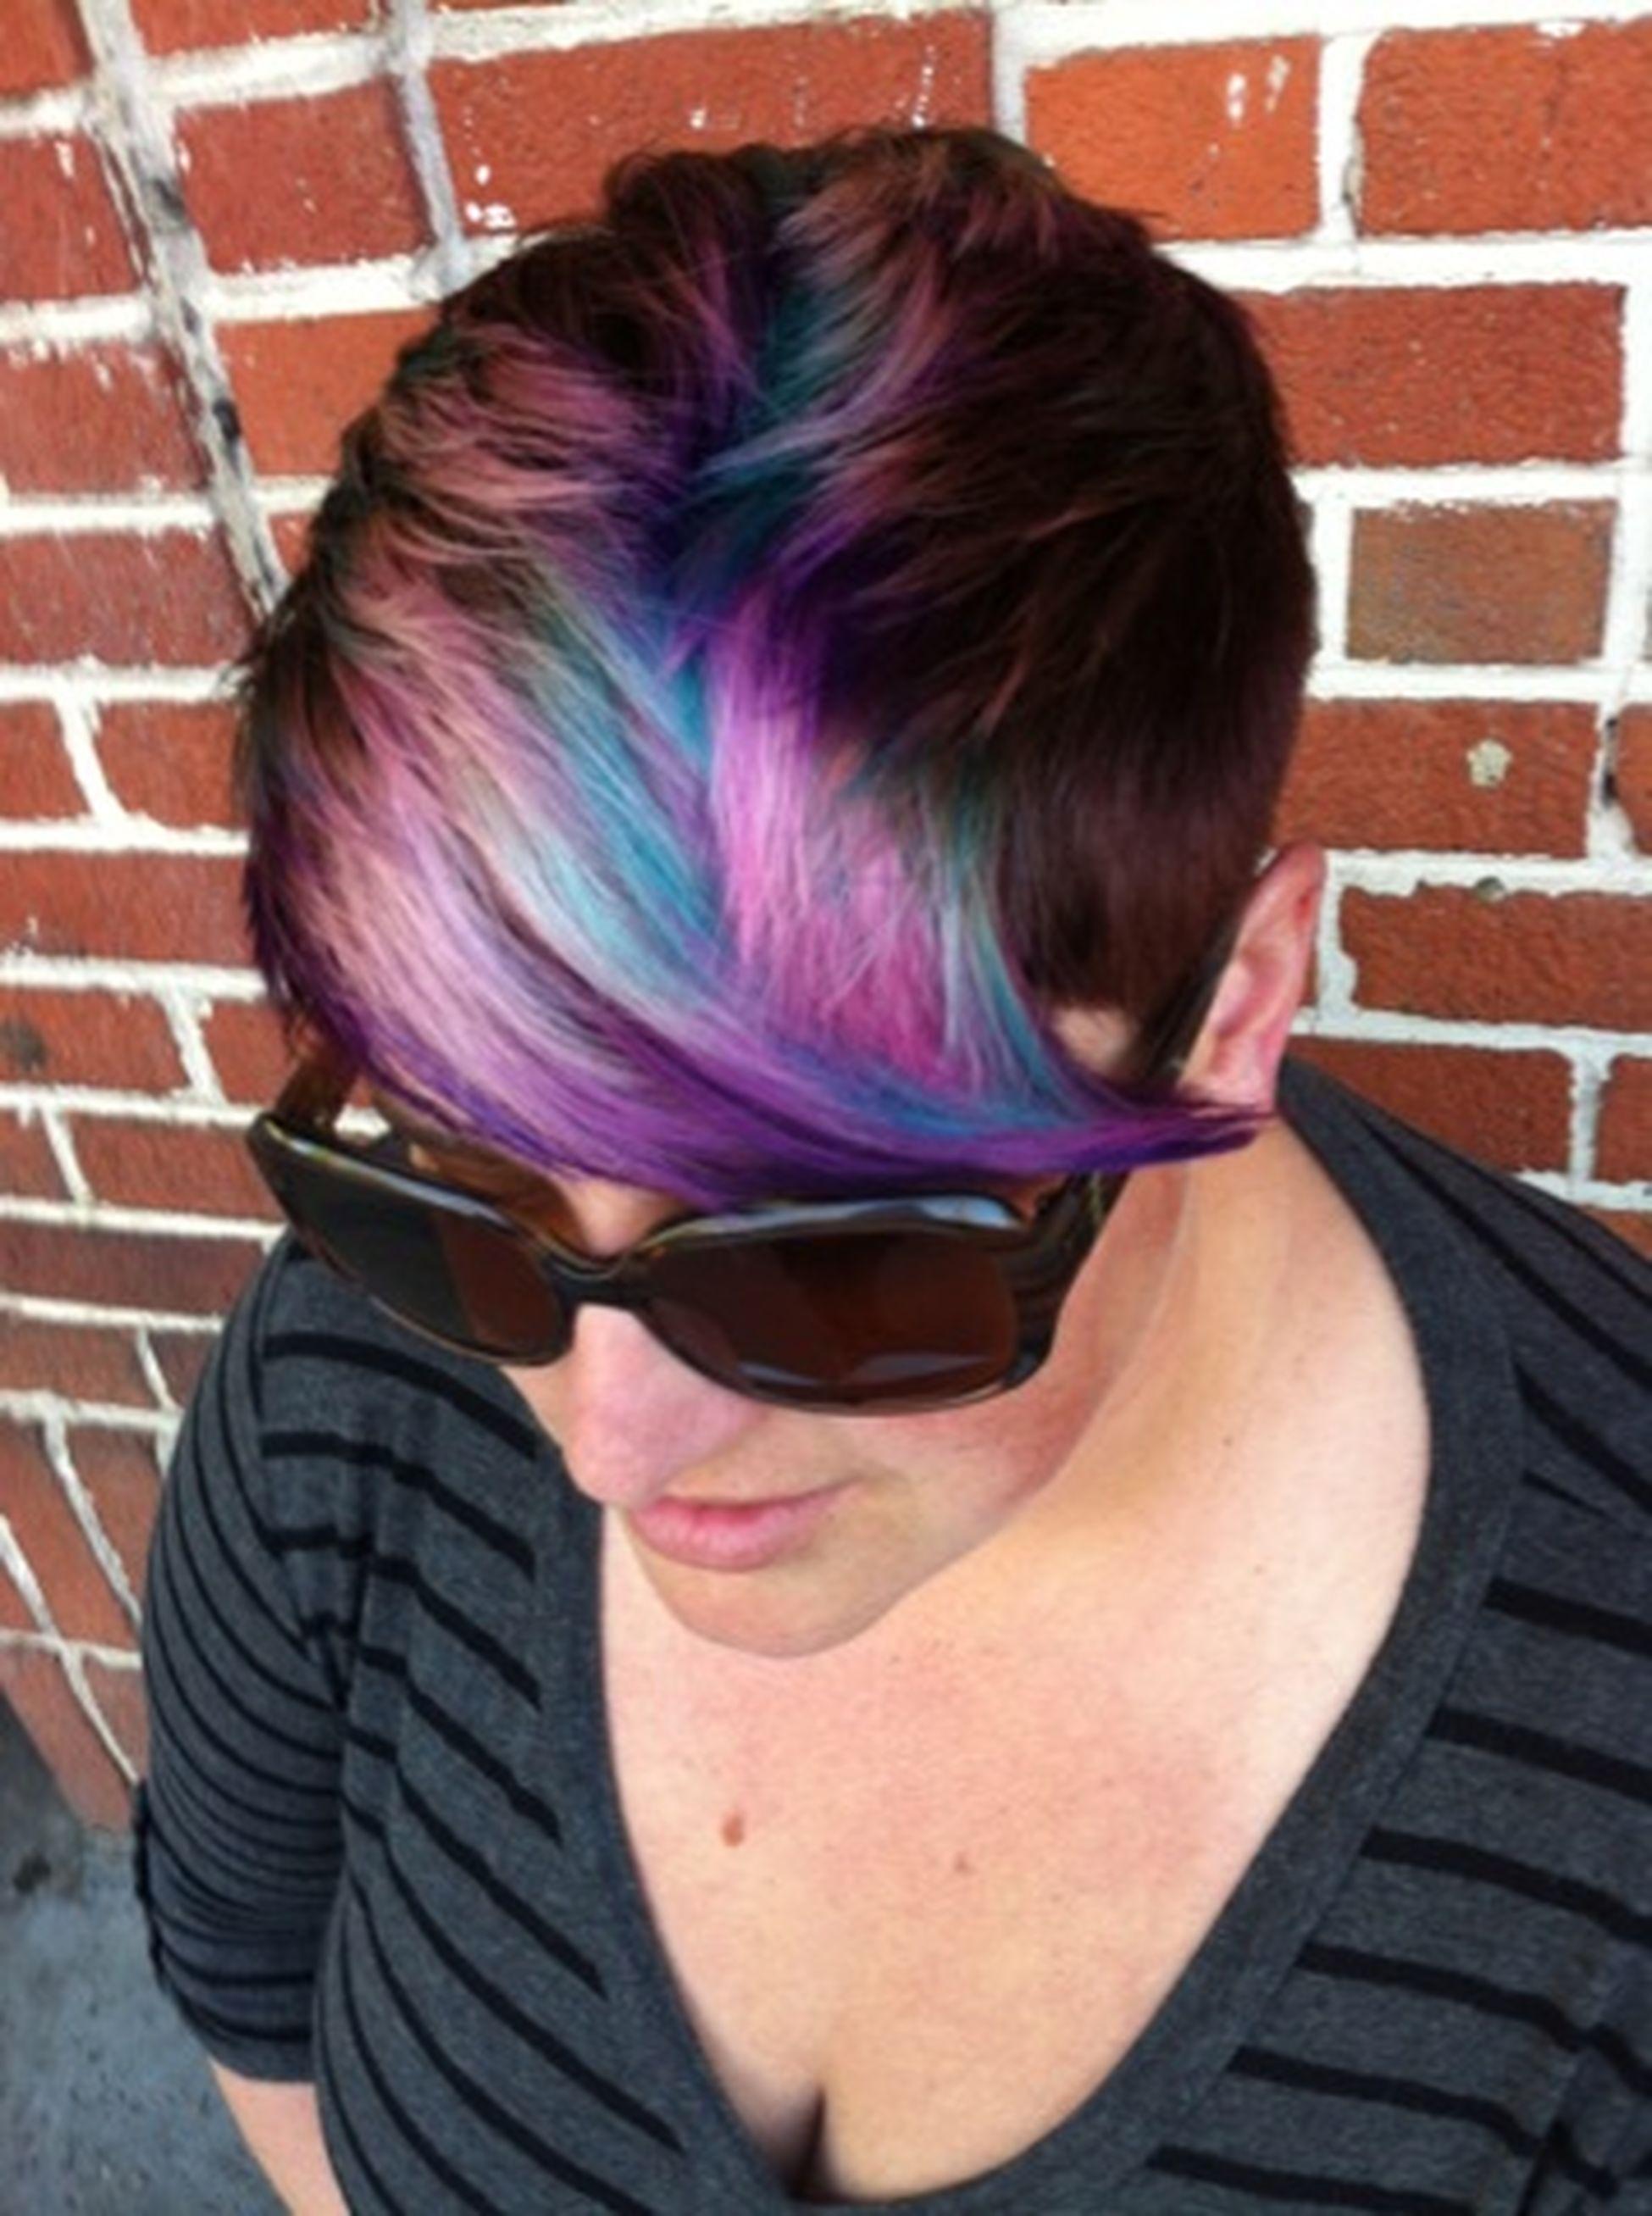 Hair Color Haircolor Fun Hairbyme Downtownsalonandgallery Chico, California Nofilternoedit